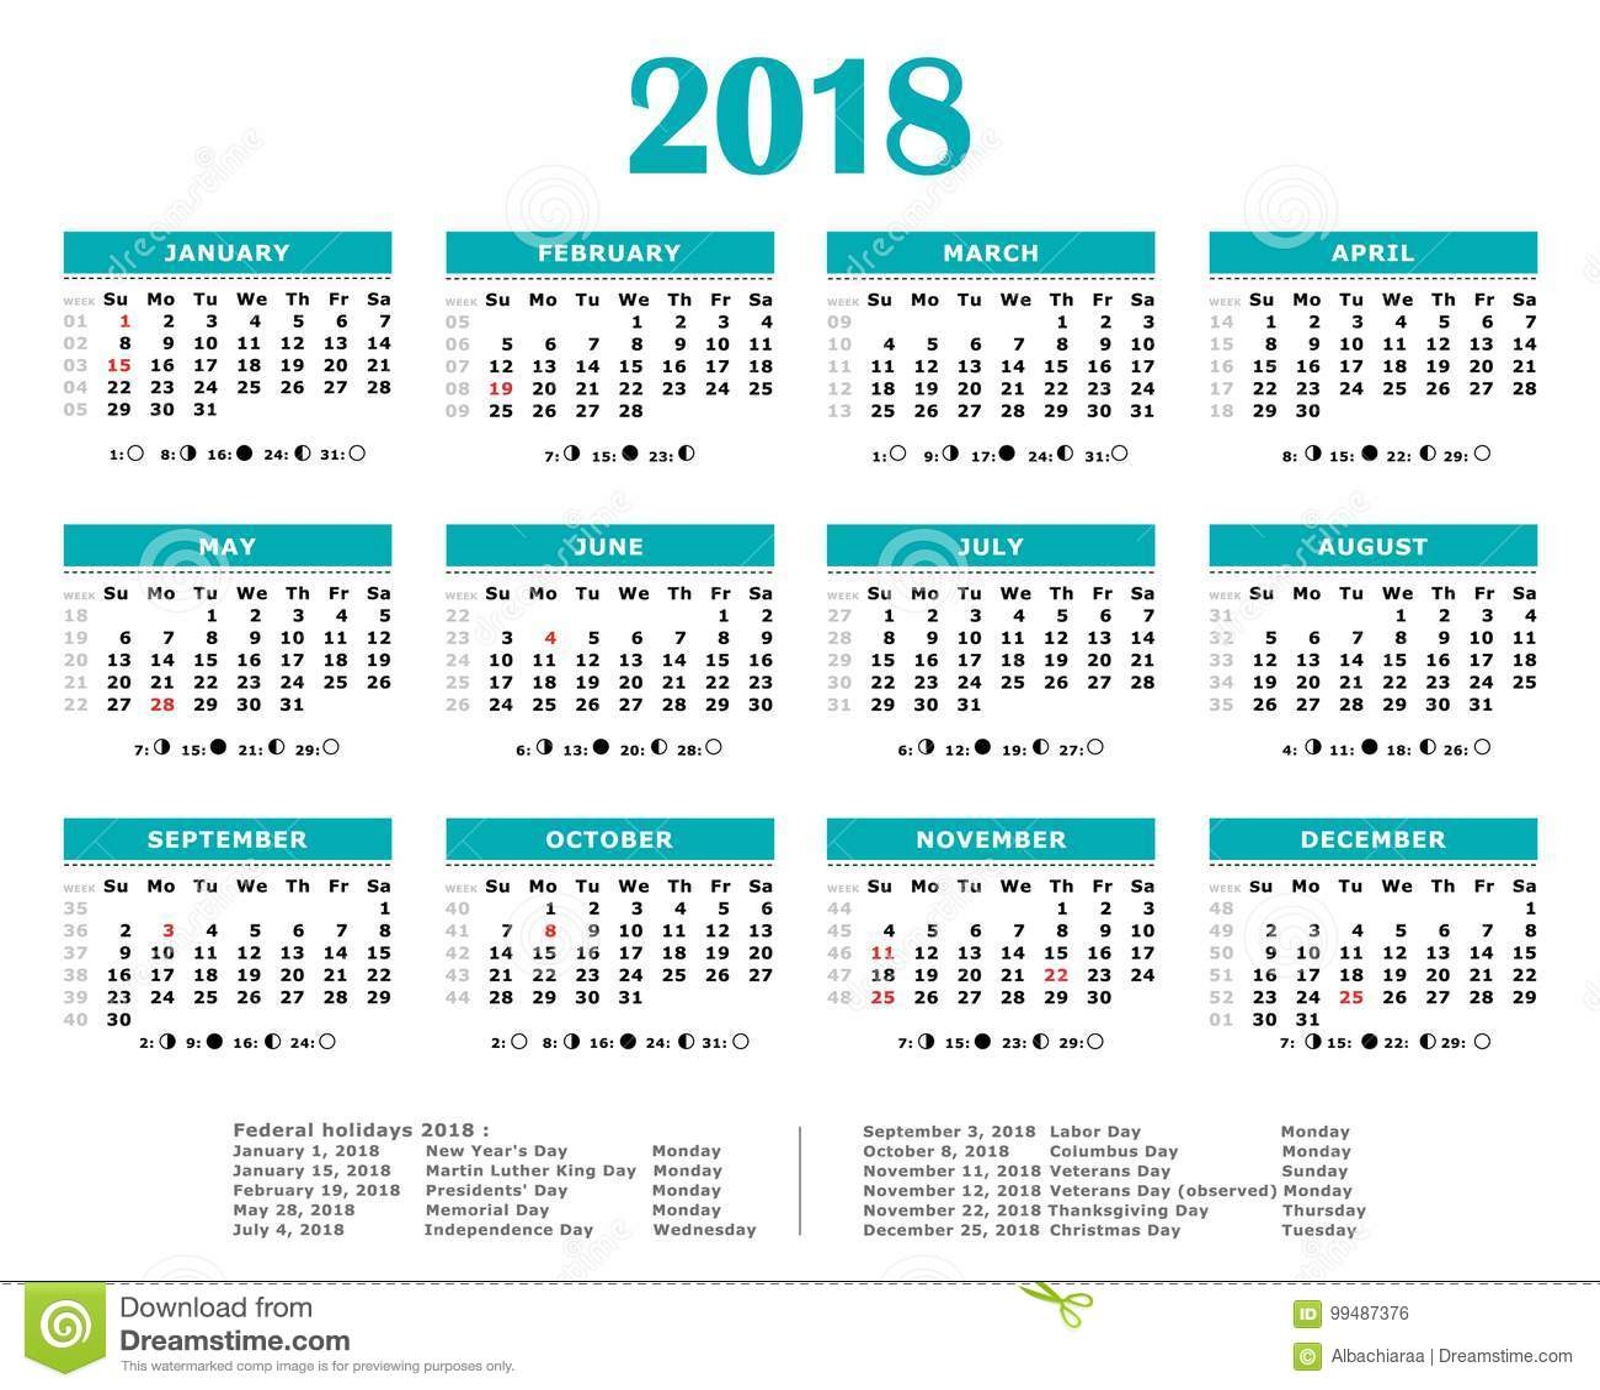 Year Calendar In Weeks : Moon calendar vector illustration cartoondealer